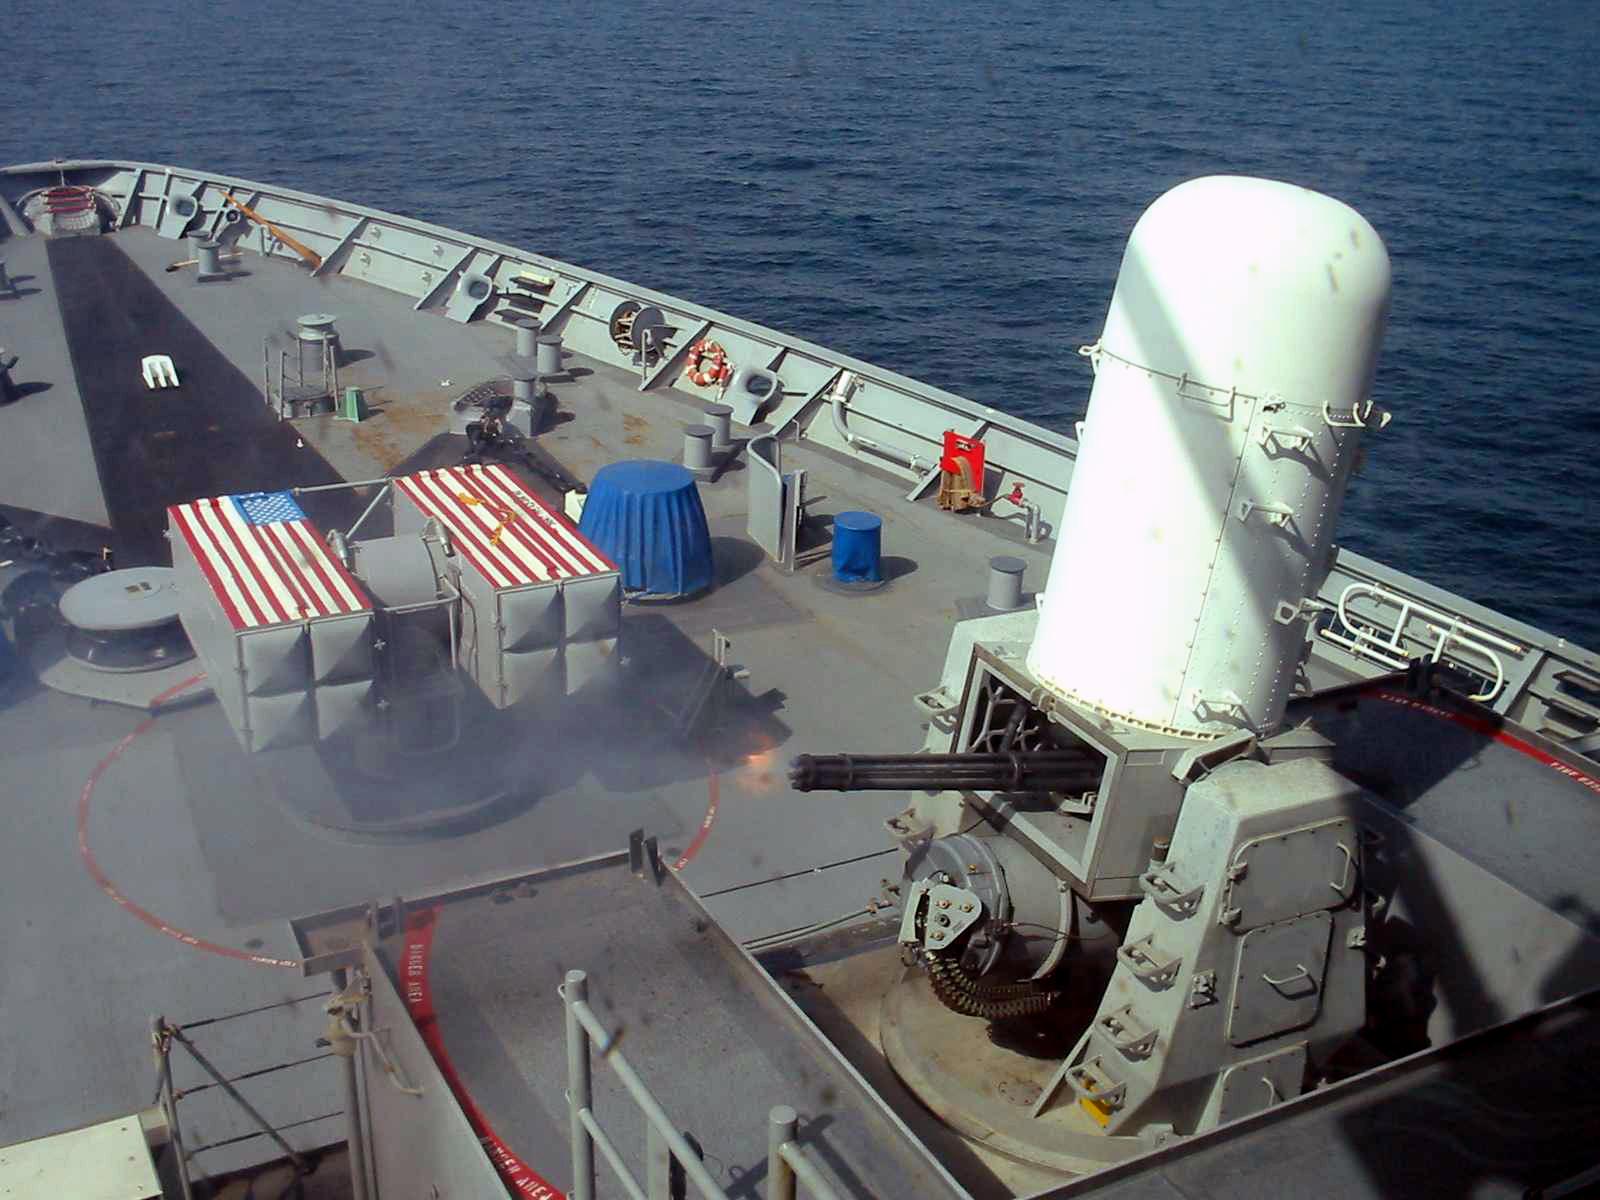 Phalanx_CIWS_PAC_fire_USS_Rainer.jpg